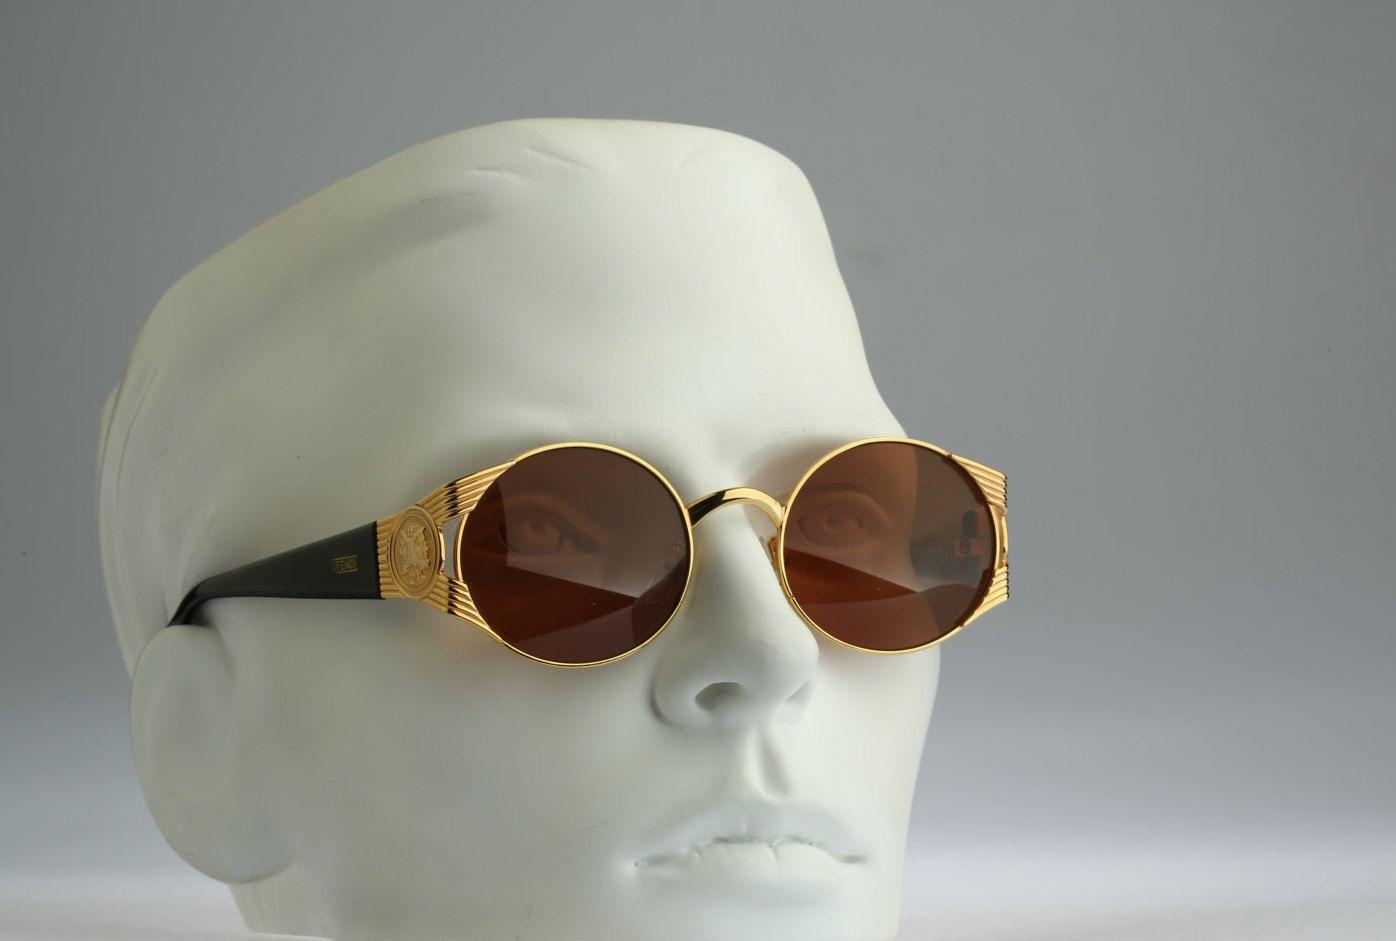 131f7c2ca76 Fendi FS 240   90s Vintage sunglasses   NOS   Stunning round shade by  CarettaVintage on Etsy